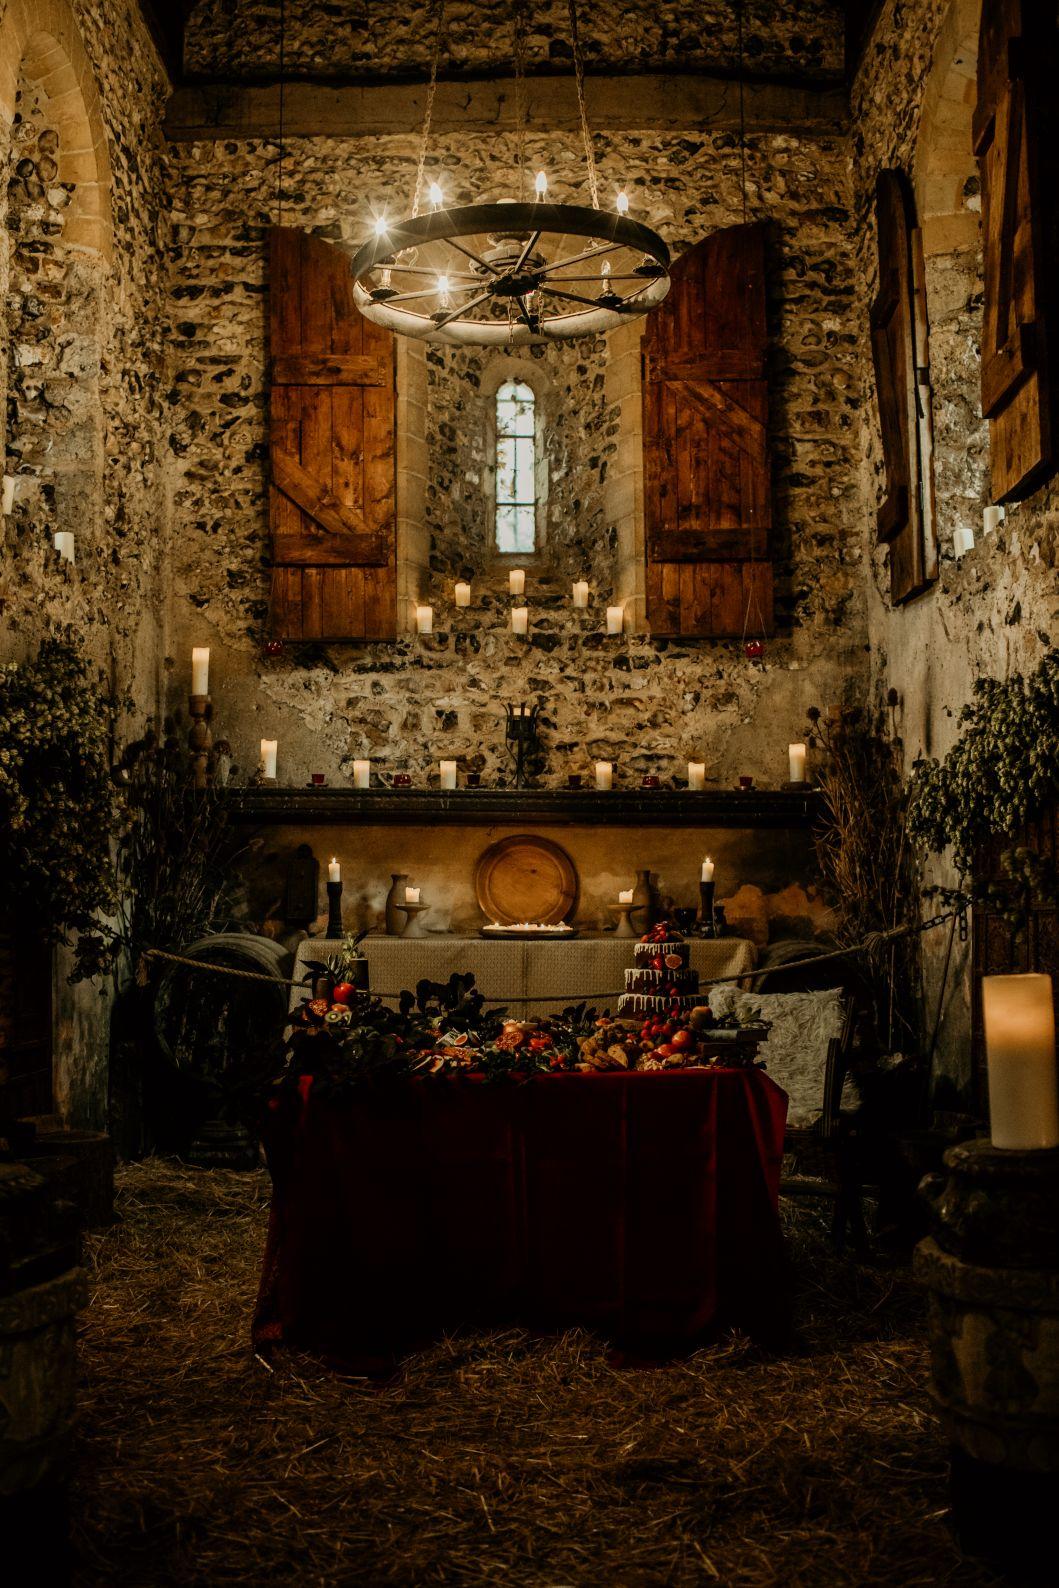 alternative fairytale wedding- snow white wedding- charlotte laurie designs-chloe mary photo- unconventional wedding- alternative wedding inspiration- alternative wedding venue- the lost village of dode